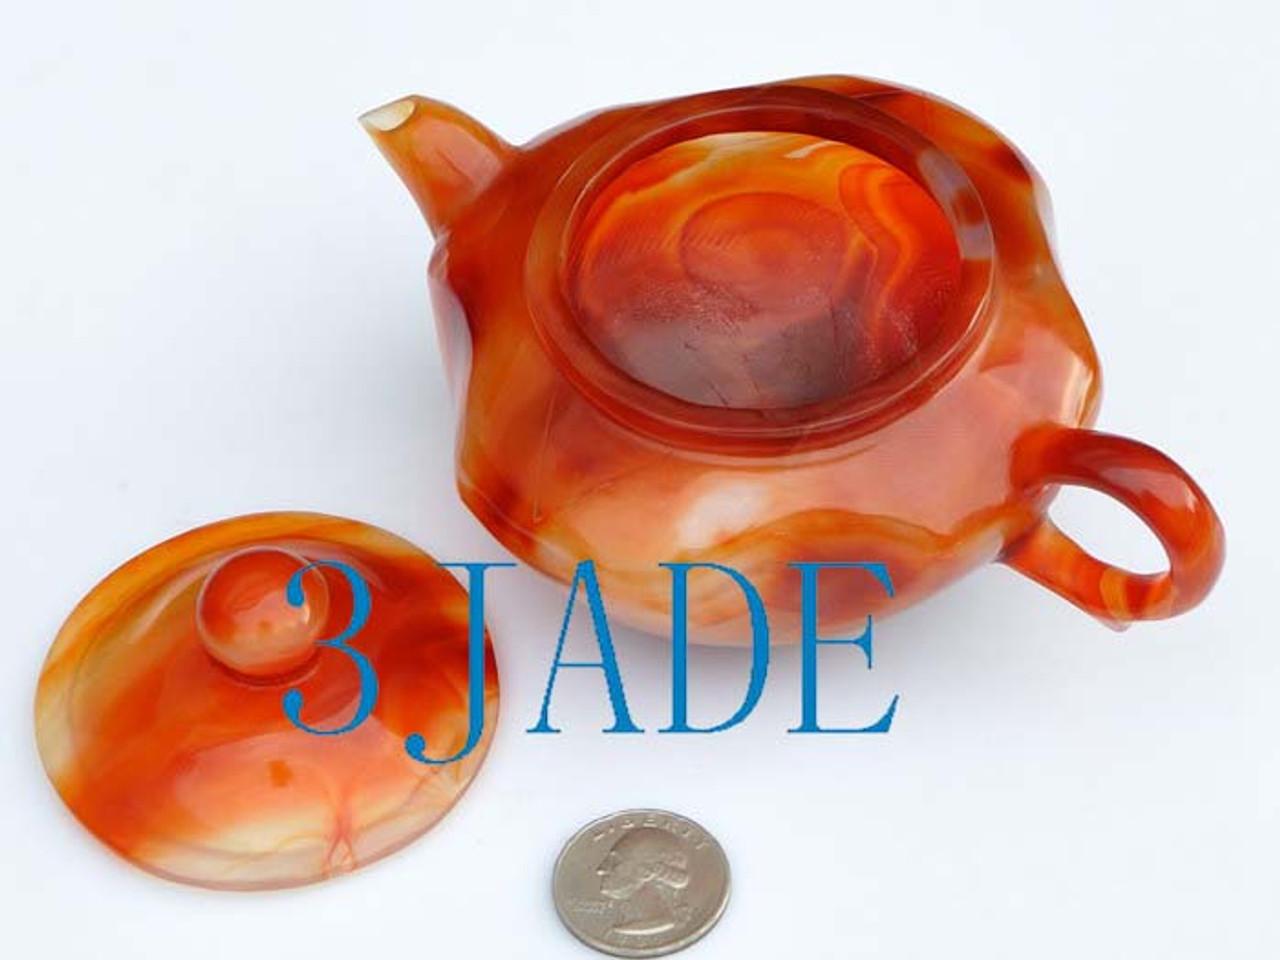 Red Agate / Carnelian Teapot / Tea Pot Statue Carving / Sculpture